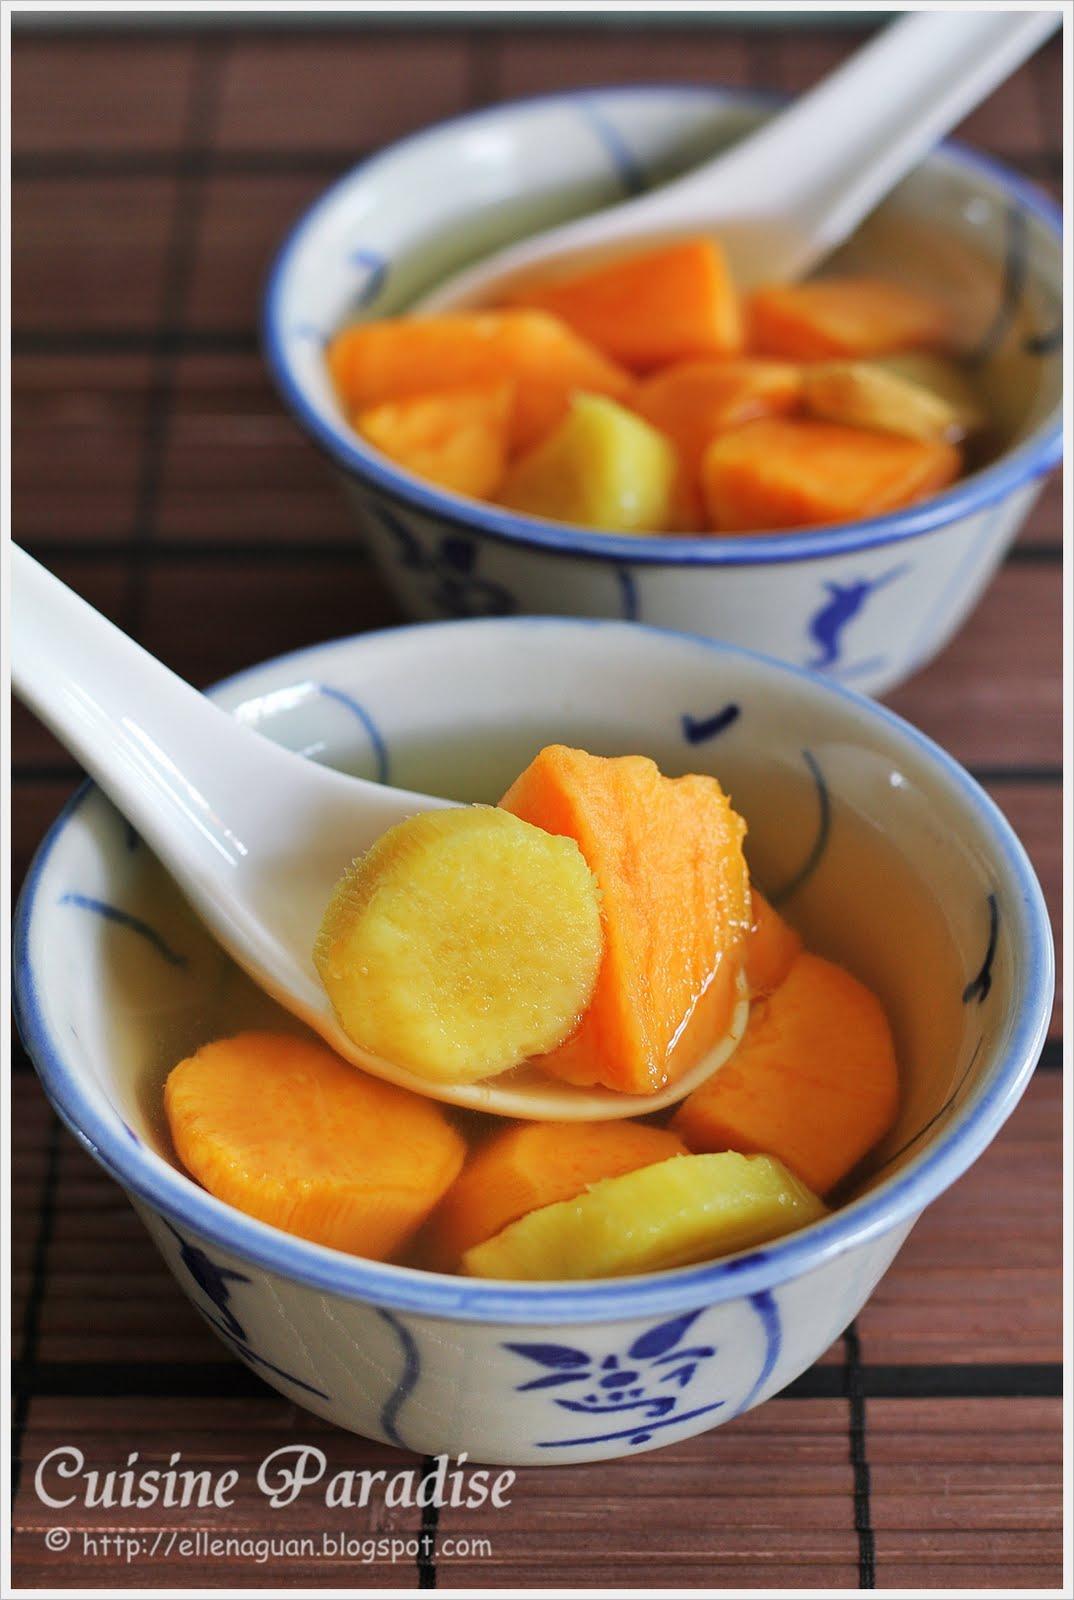 Cuisine paradise singapore food blog recipes reviews for Asian cuisine dessert